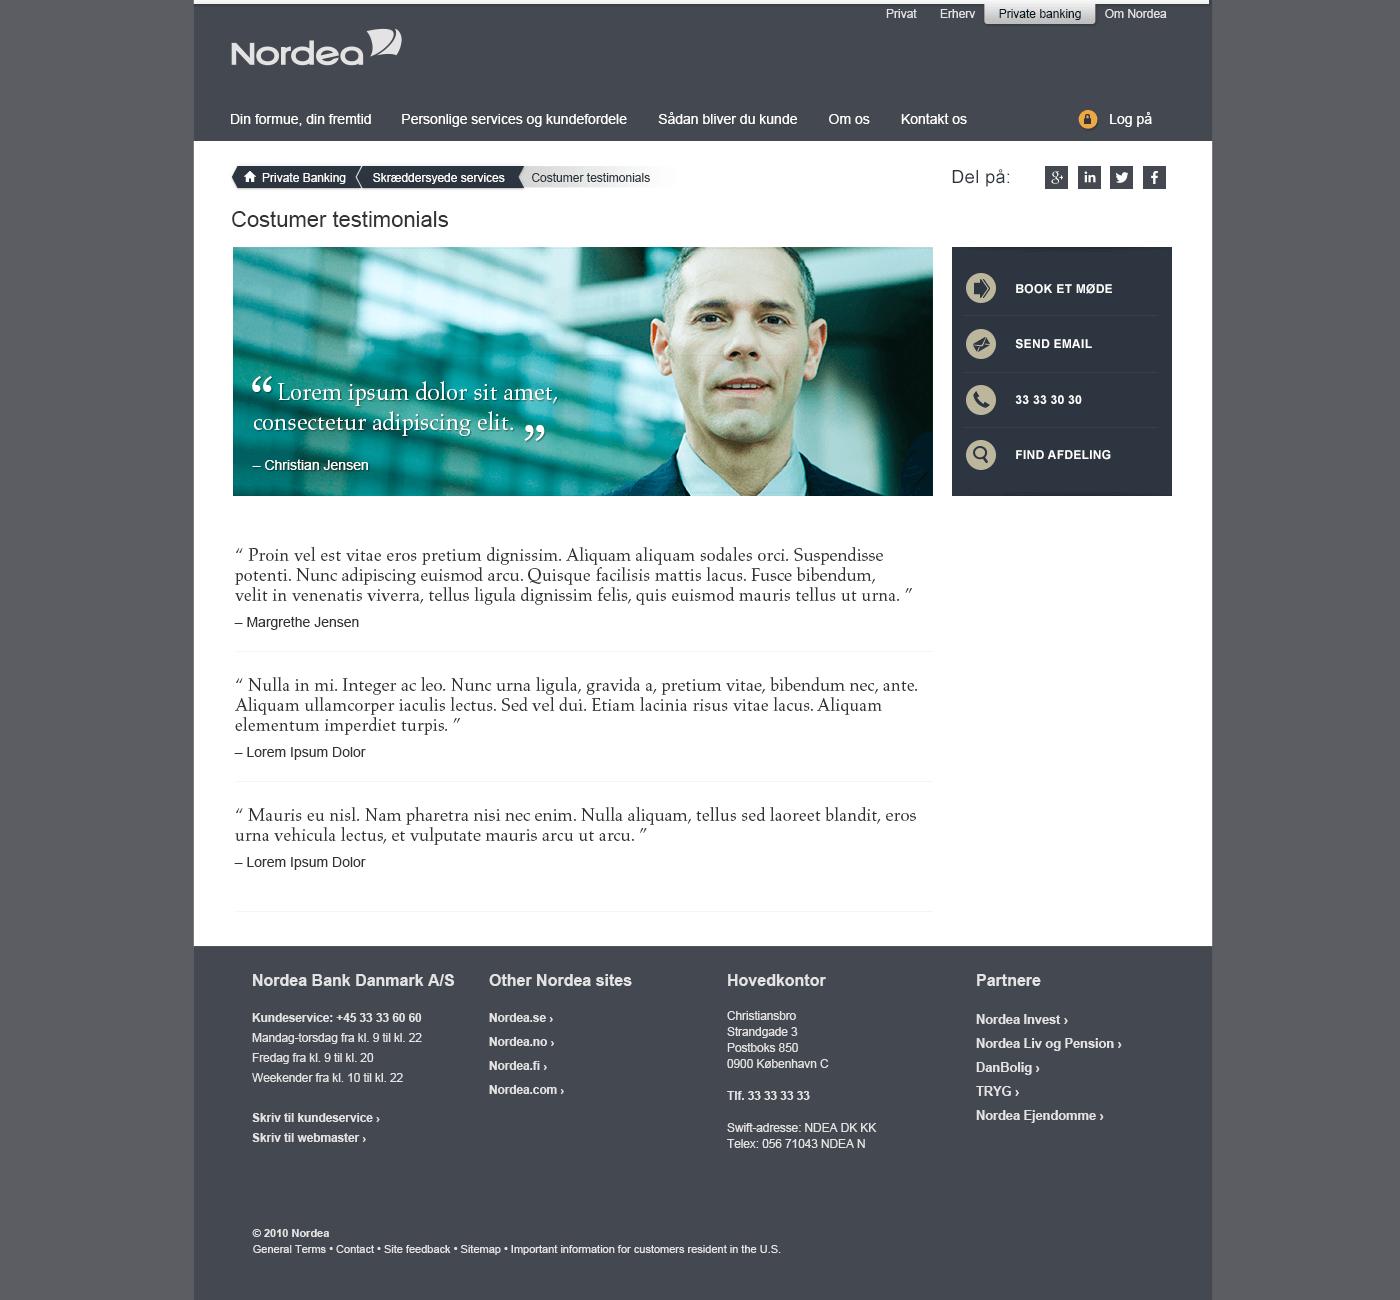 Nordeaprivatebanking_Costumer_testimonials_26_08_2015